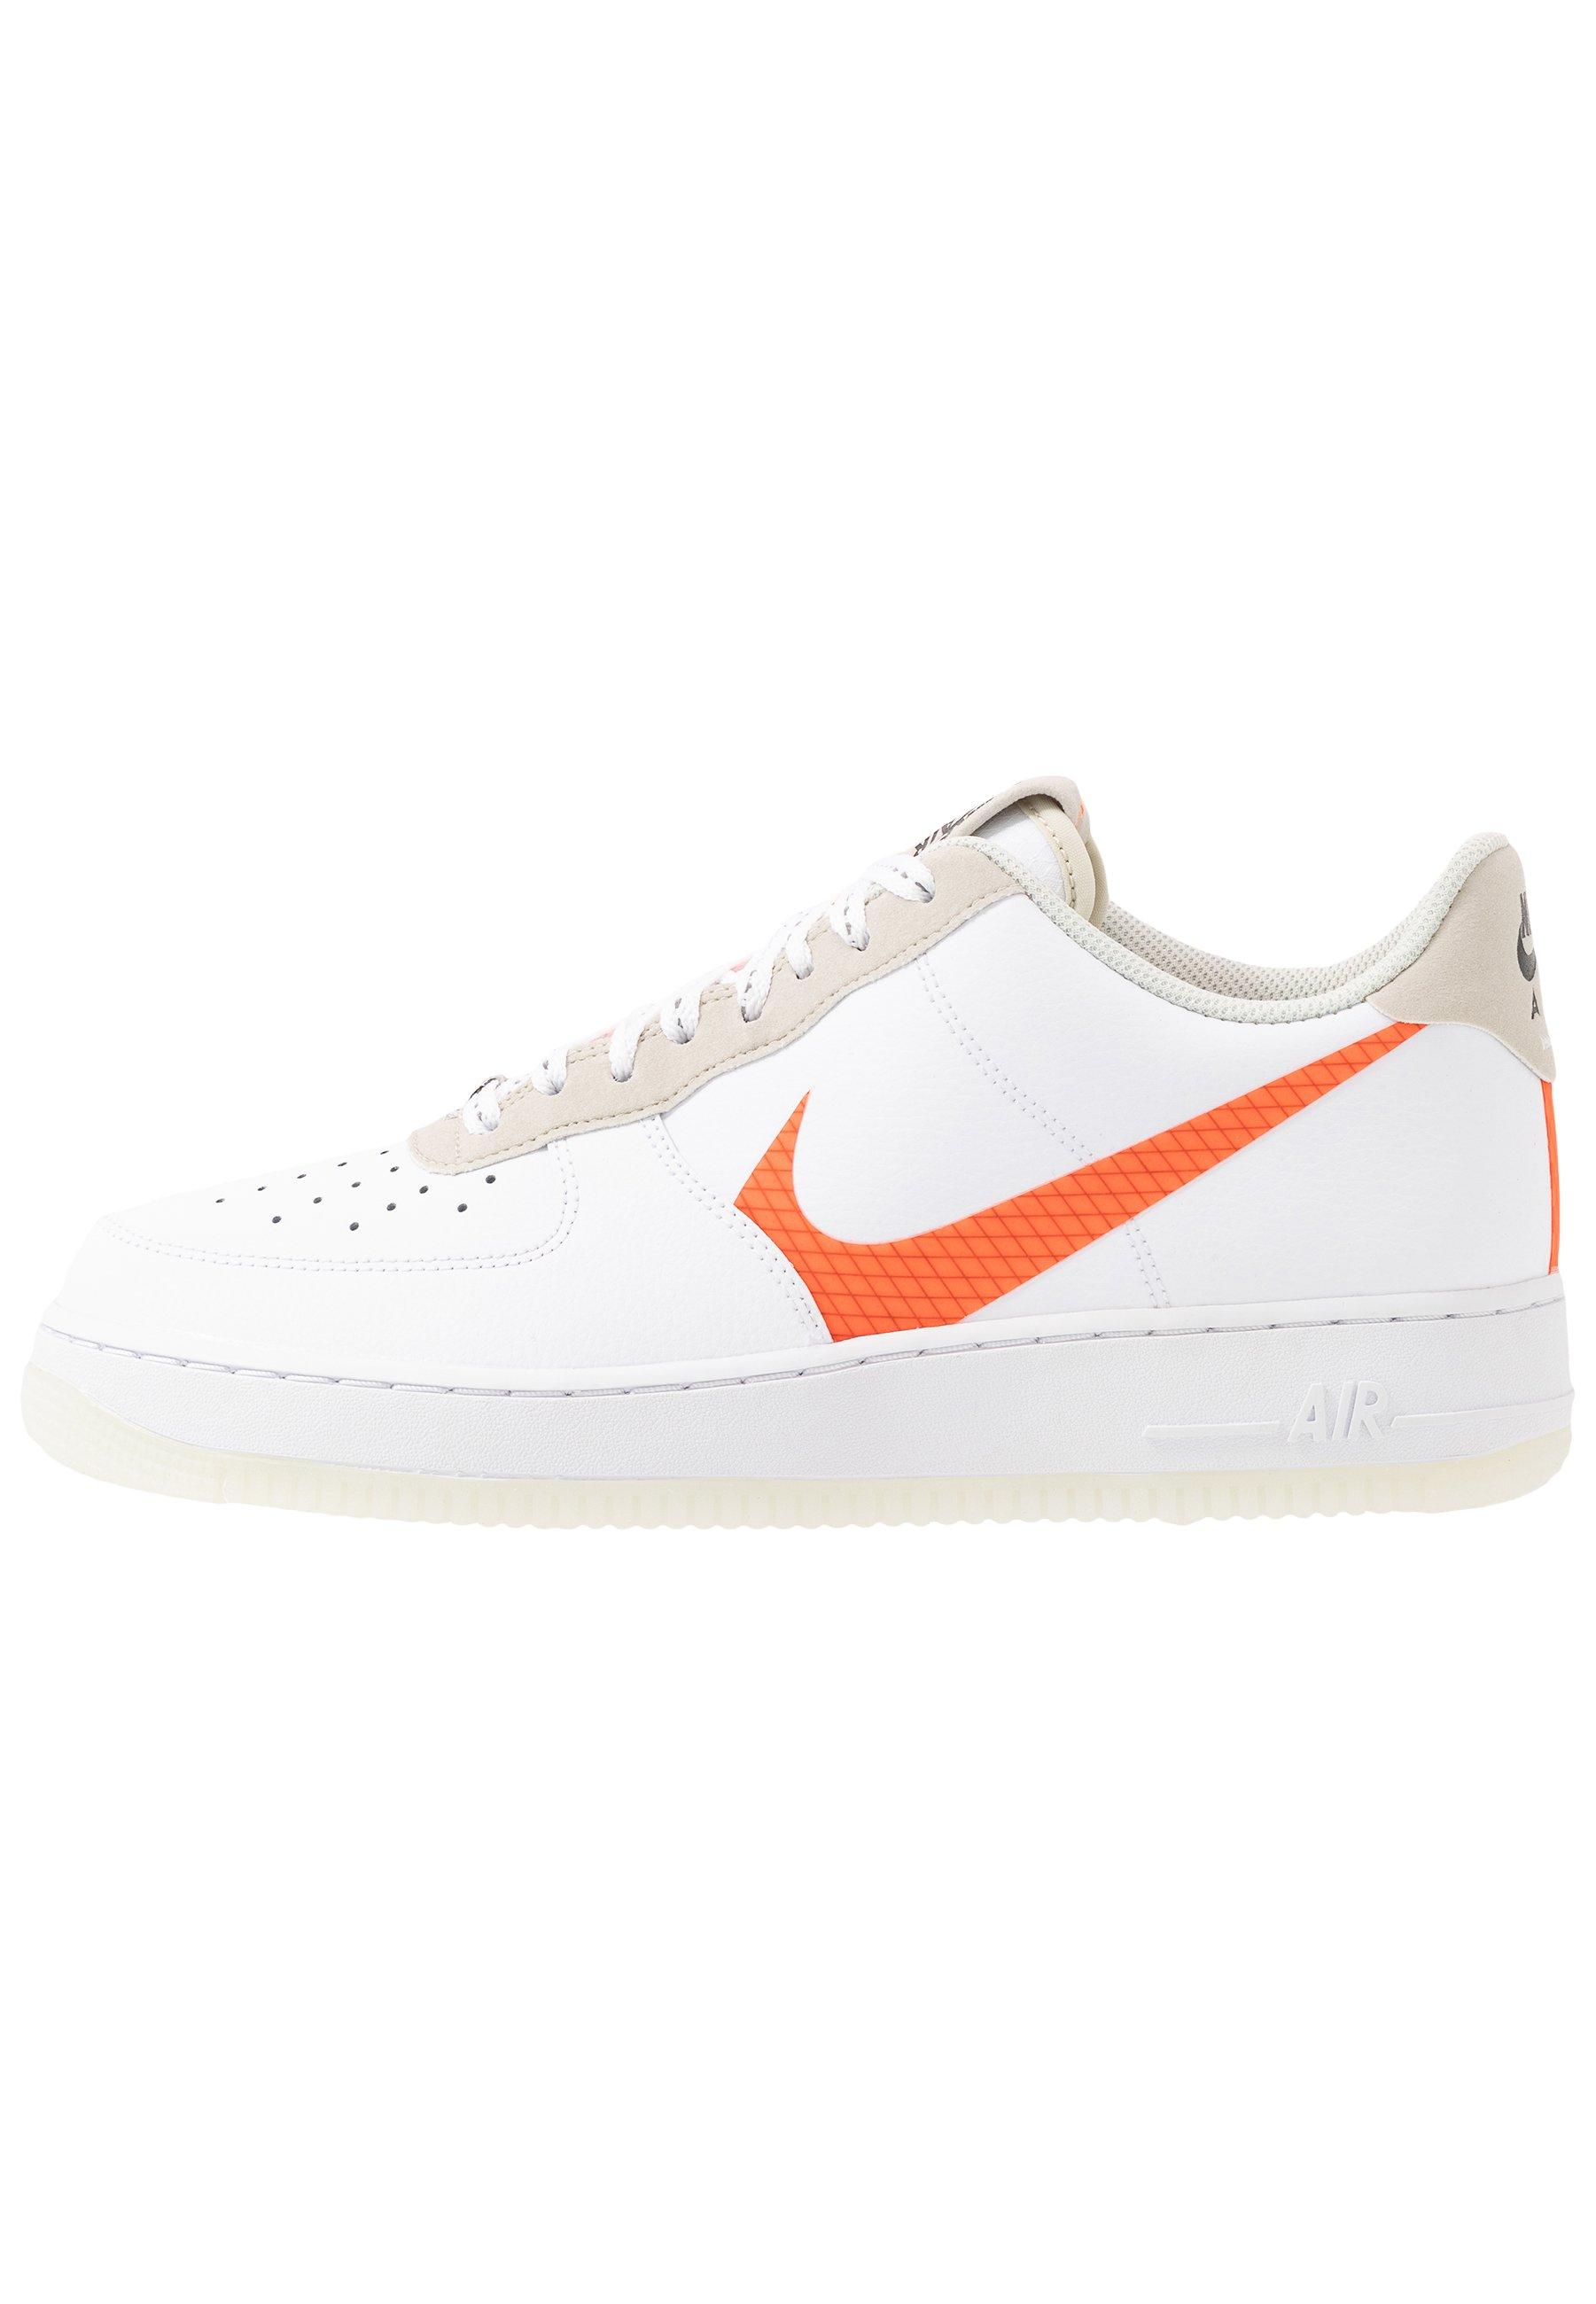 air force 1 blanche et orange